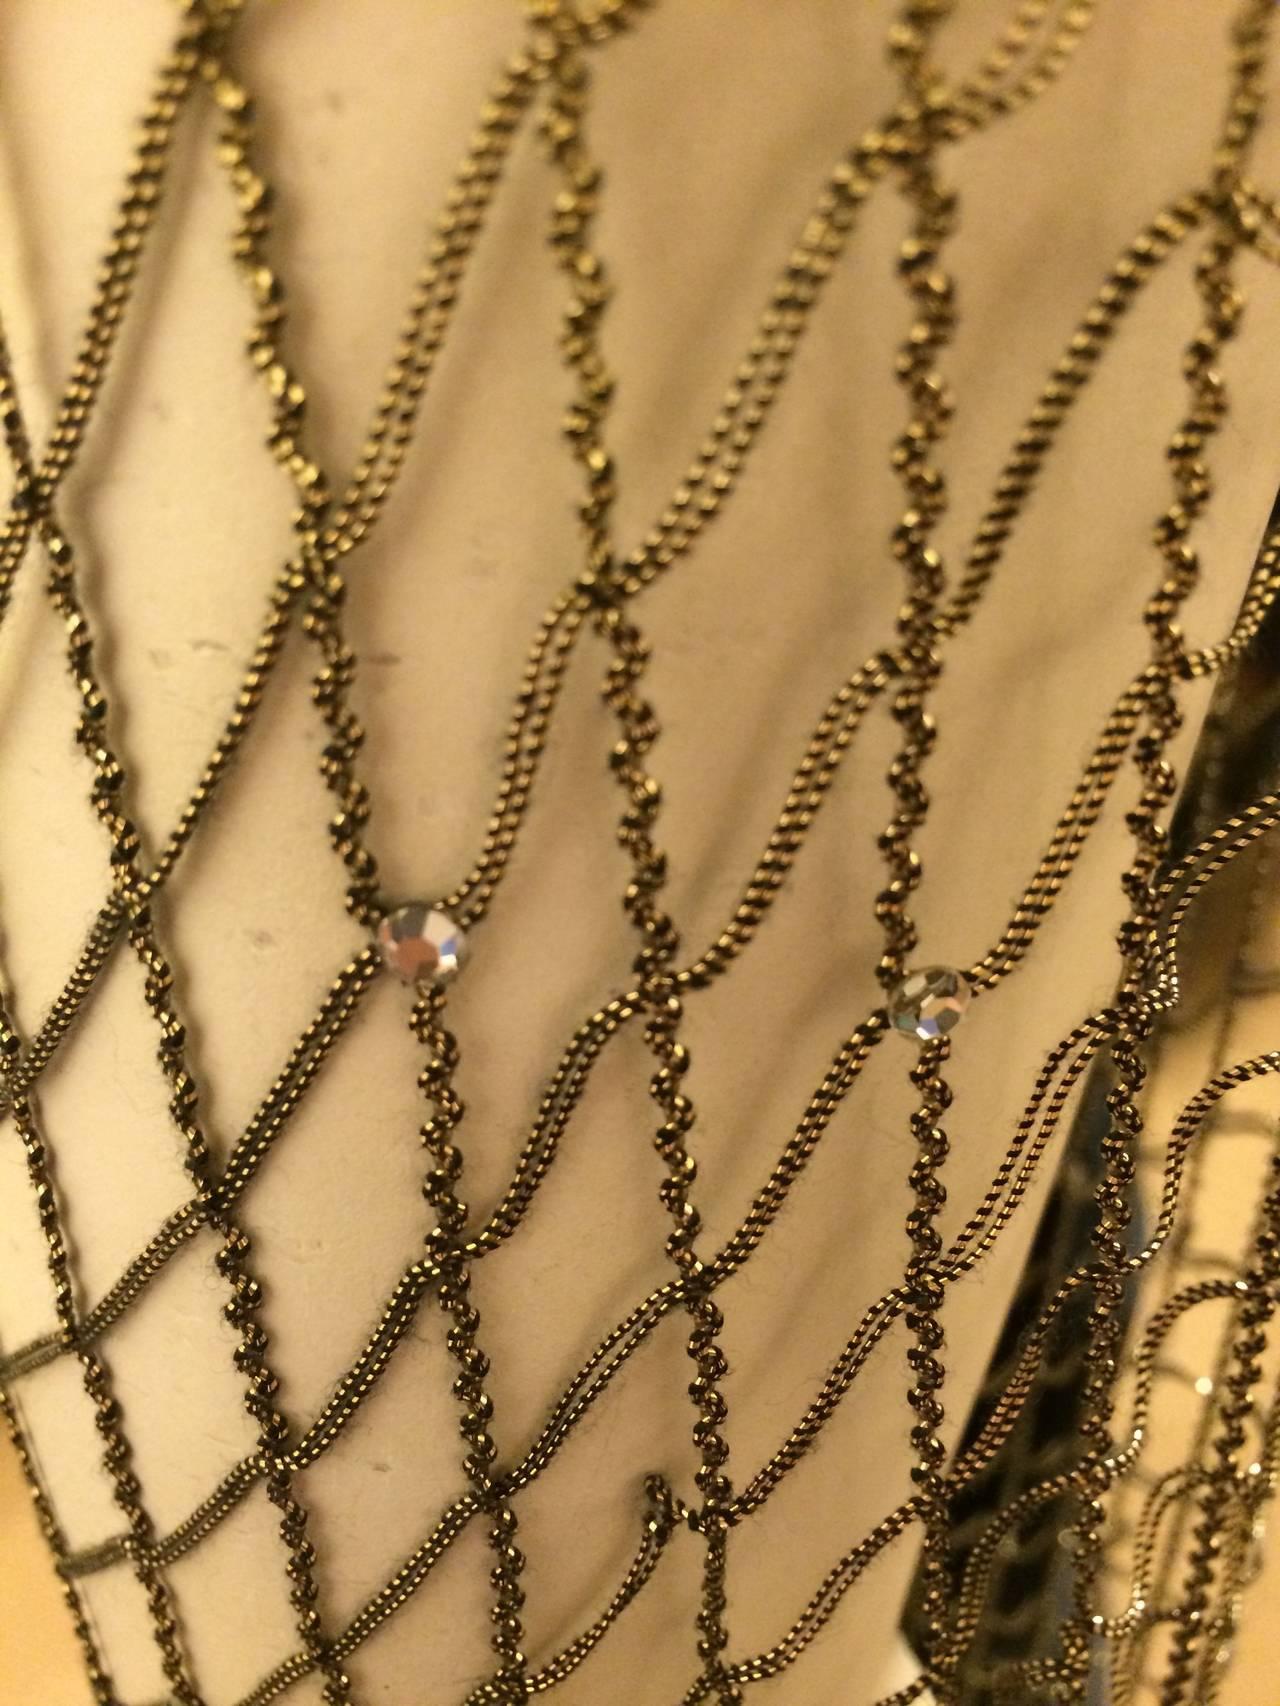 Oscar de la Renta Black Velvet Gown with Gold Netting 7